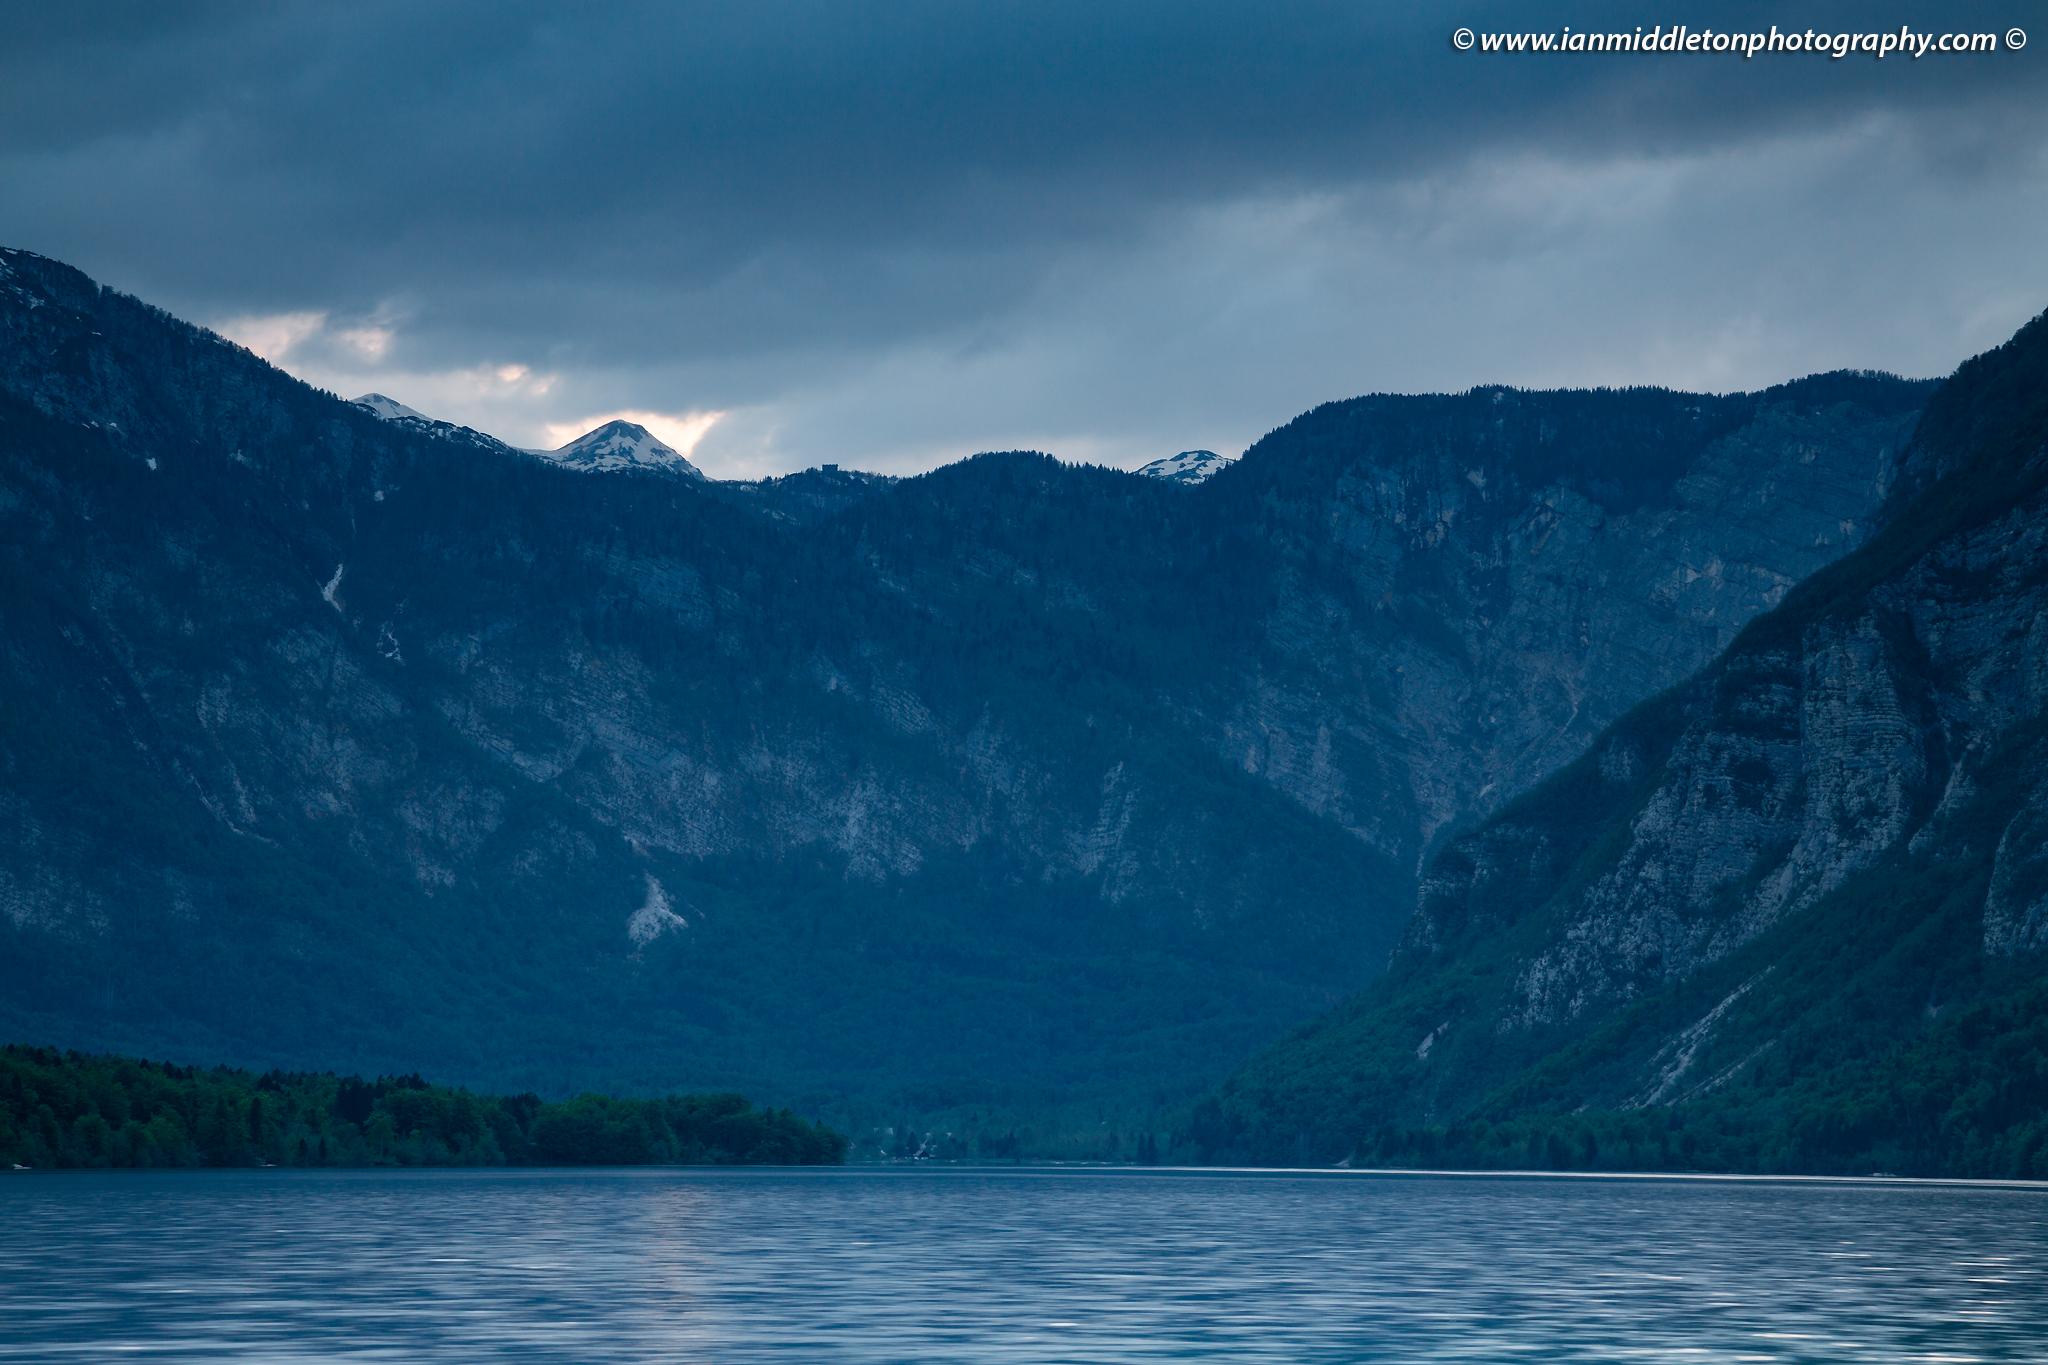 Moody clouds over Lake Bohinj, Triglav National Park, Slovenia.